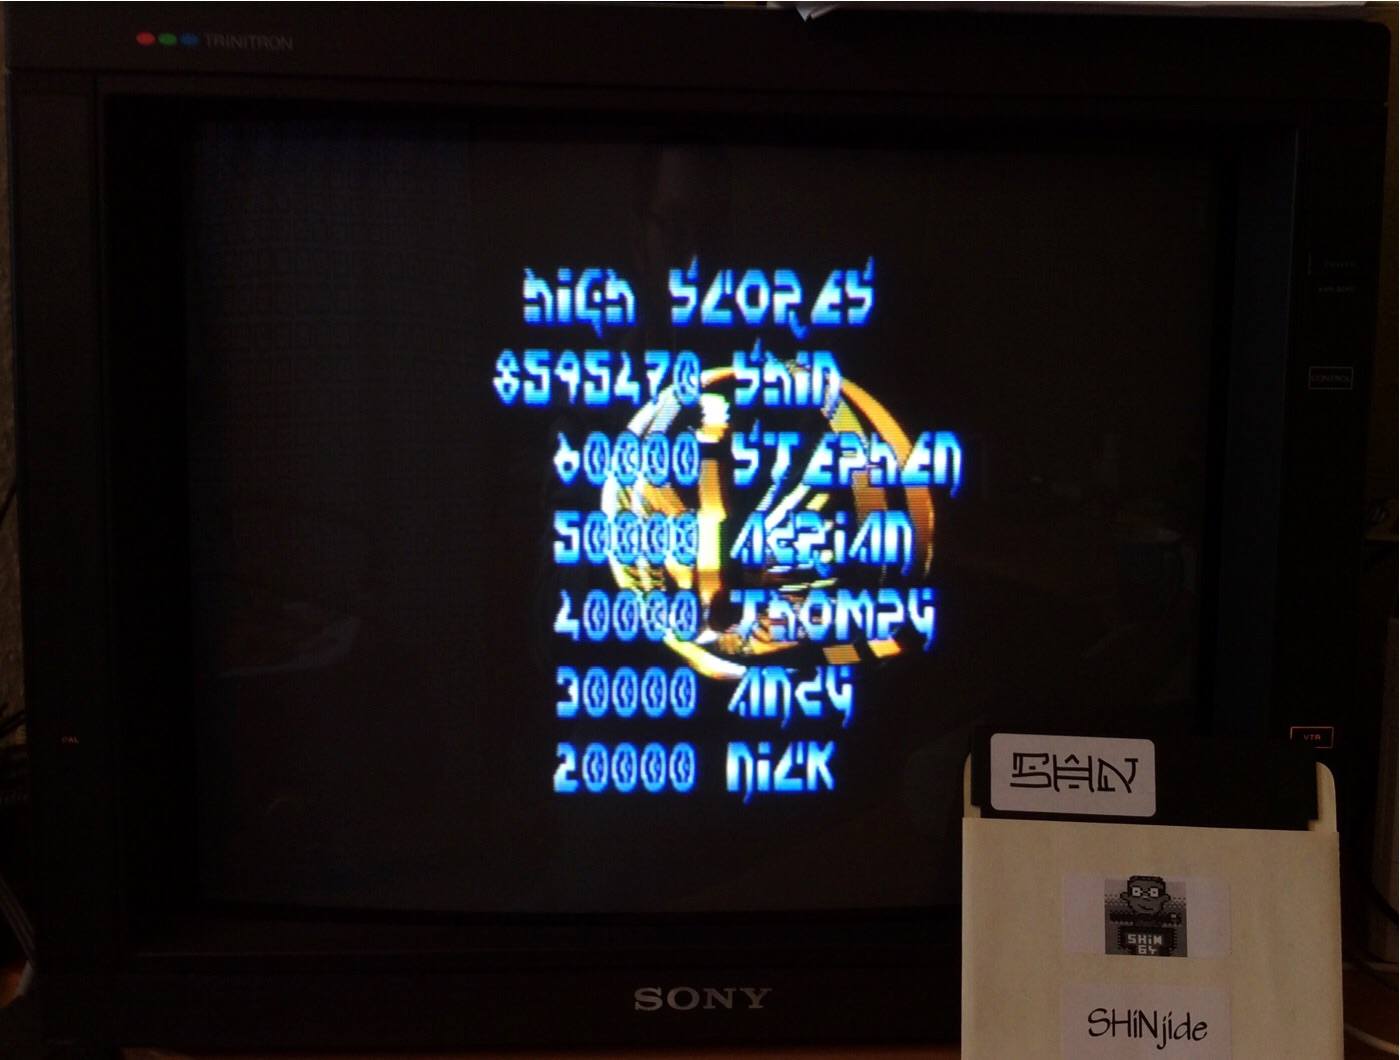 SHiNjide: Novastorm (3DO) 8,595,470 points on 2014-12-21 05:26:40